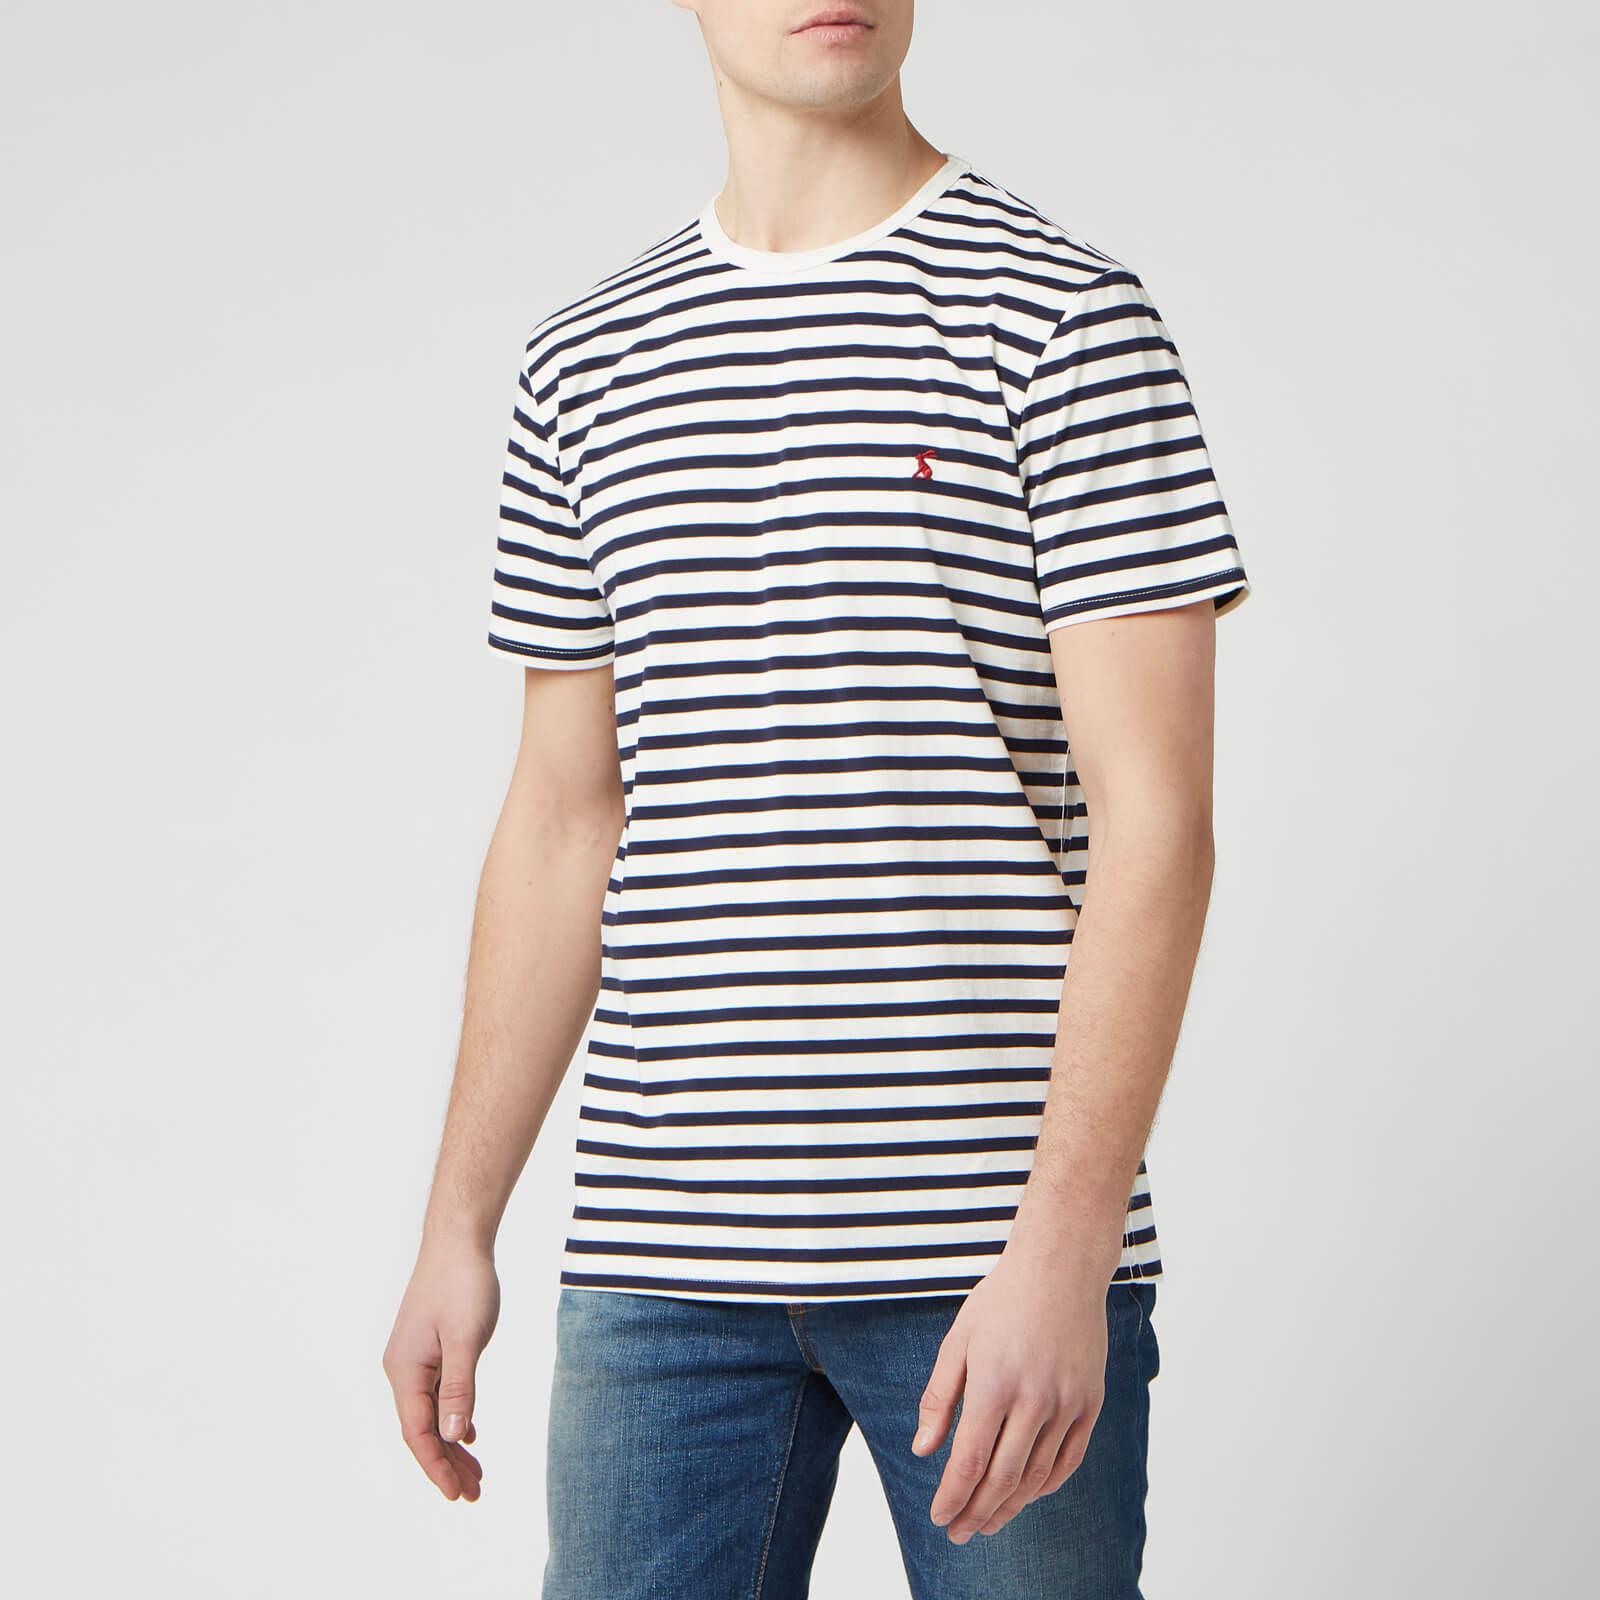 Joules Men's Boathouse T-Shirt - Cream Navy Stripe - XXL - Cream